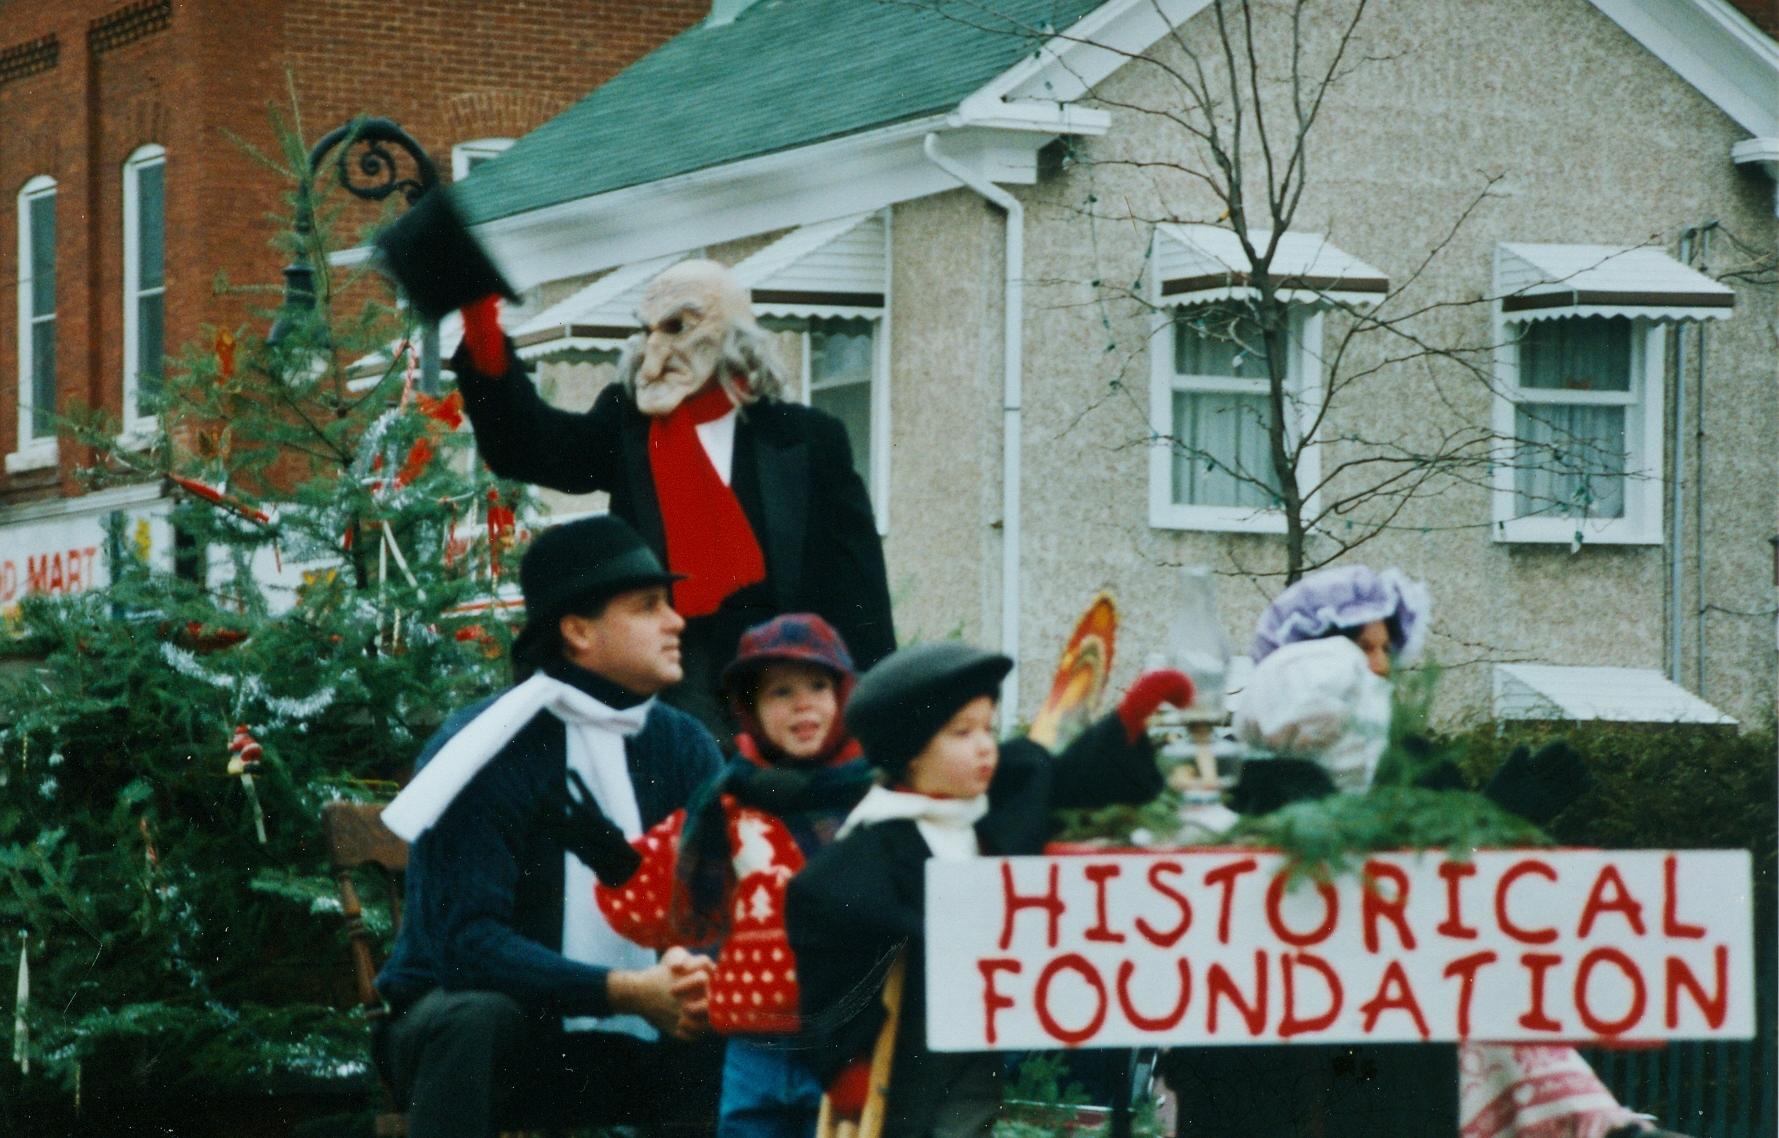 MHF Christmas parade 2.jpg